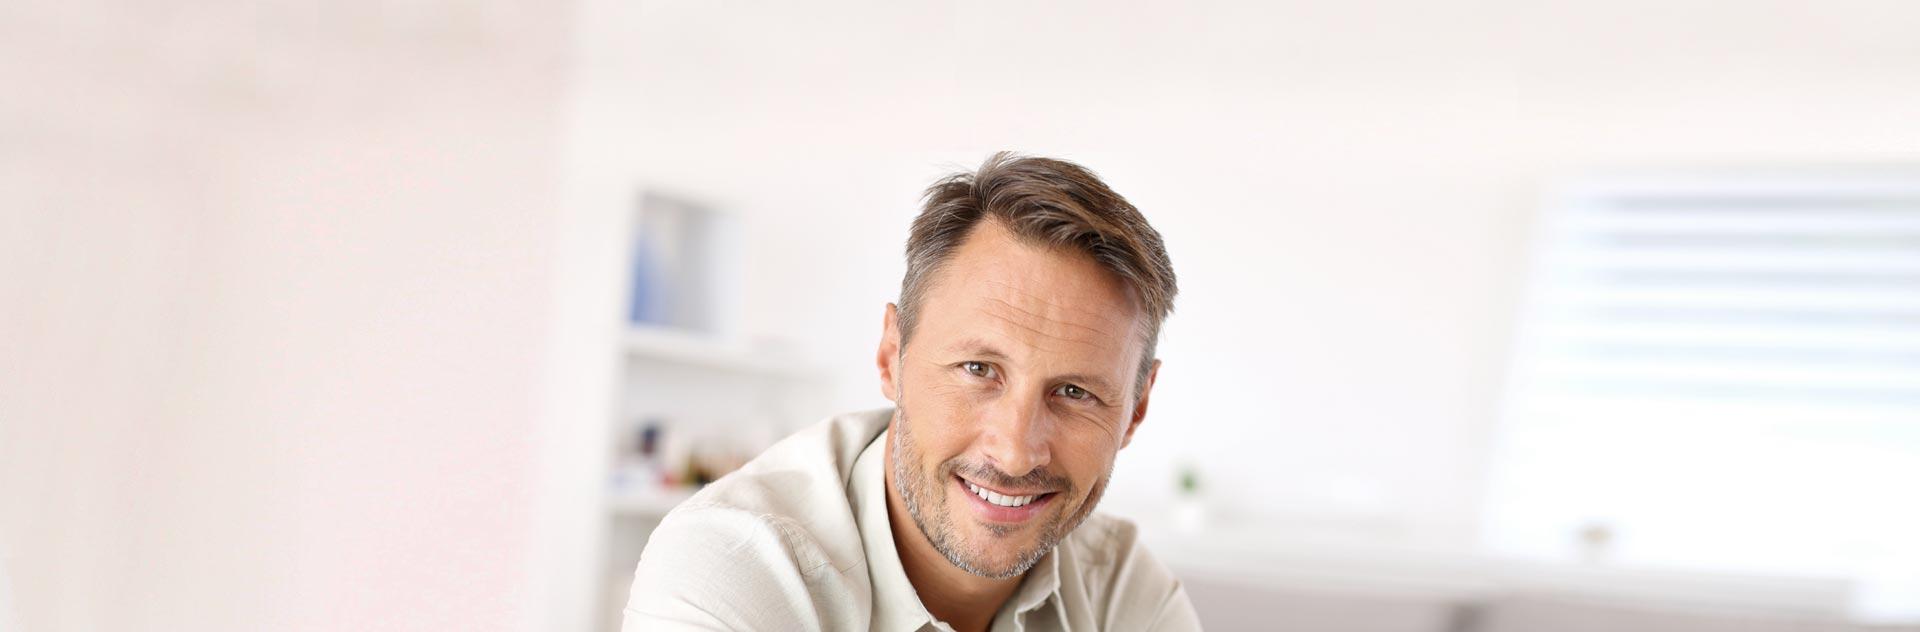 Hombre sonriendo tras optar por las Pelucas Estéticas de Capilárea